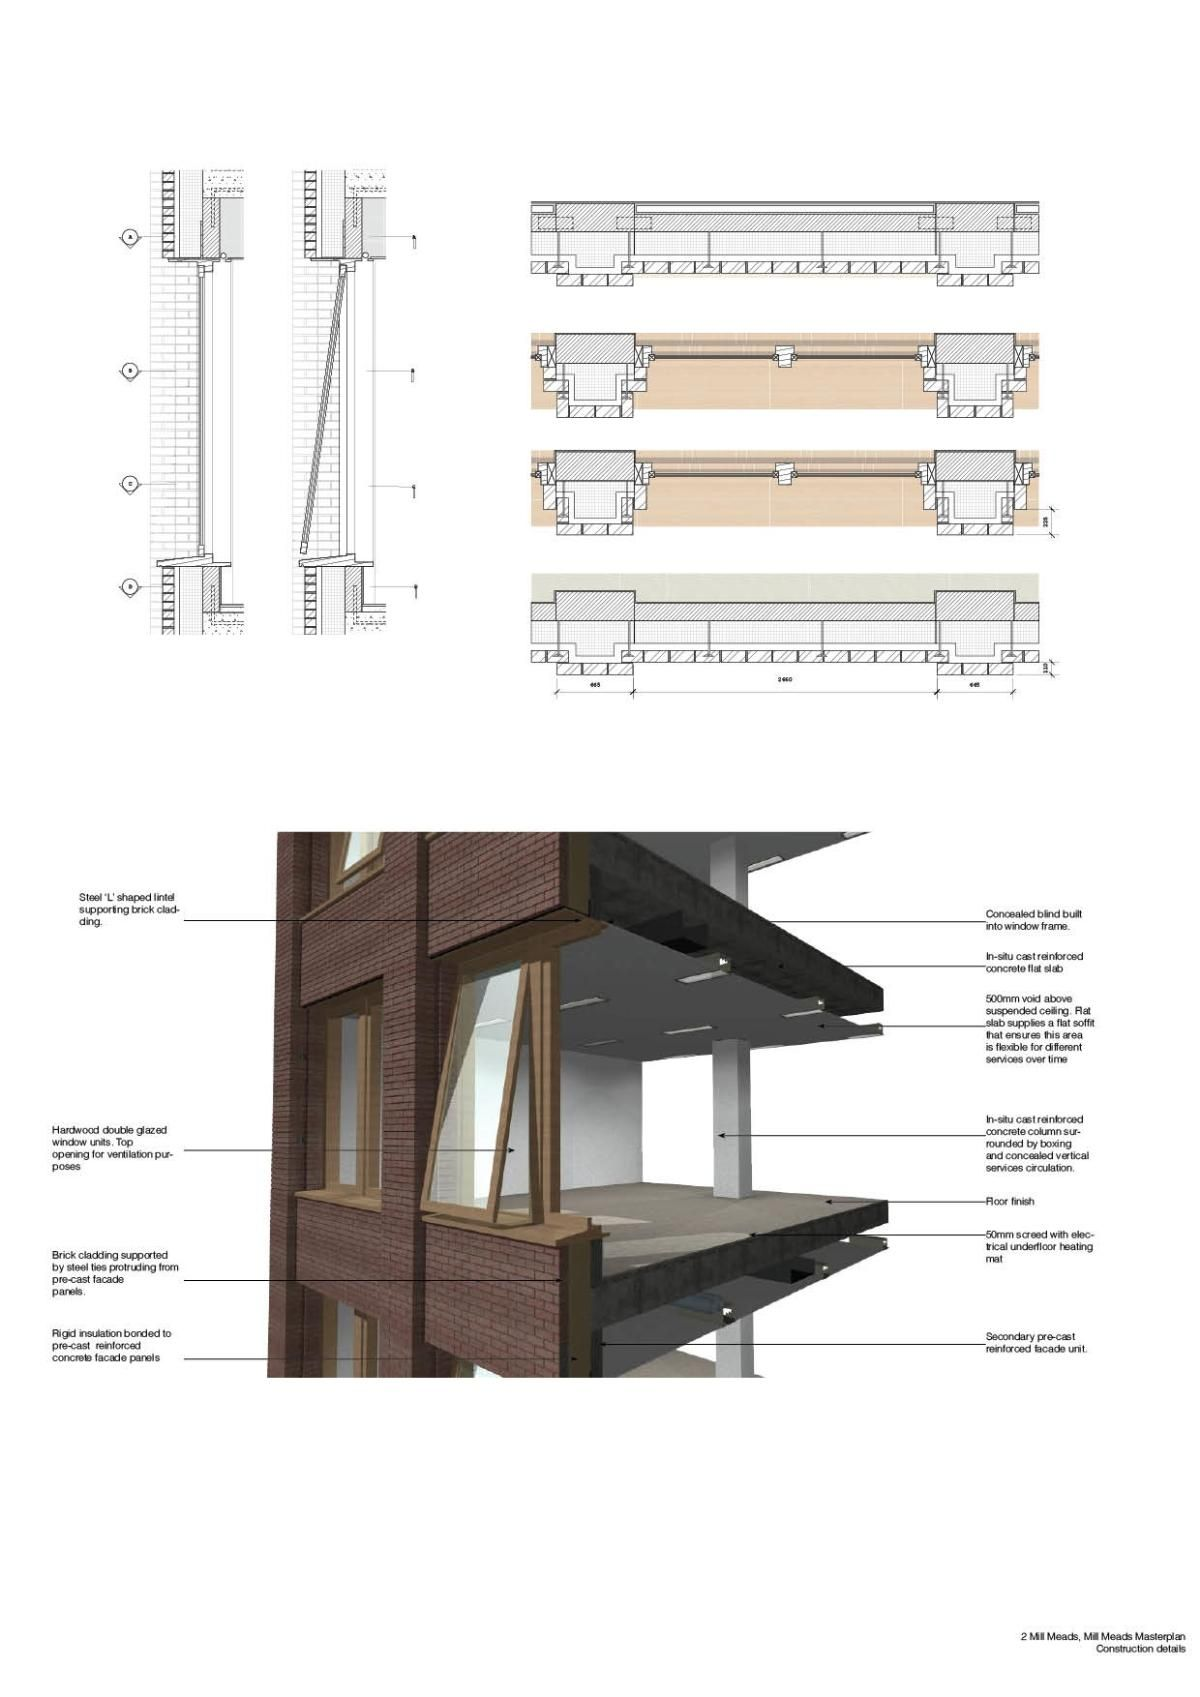 Two Mill Meads A Generic Urban Building Joseph Lyth Kingston